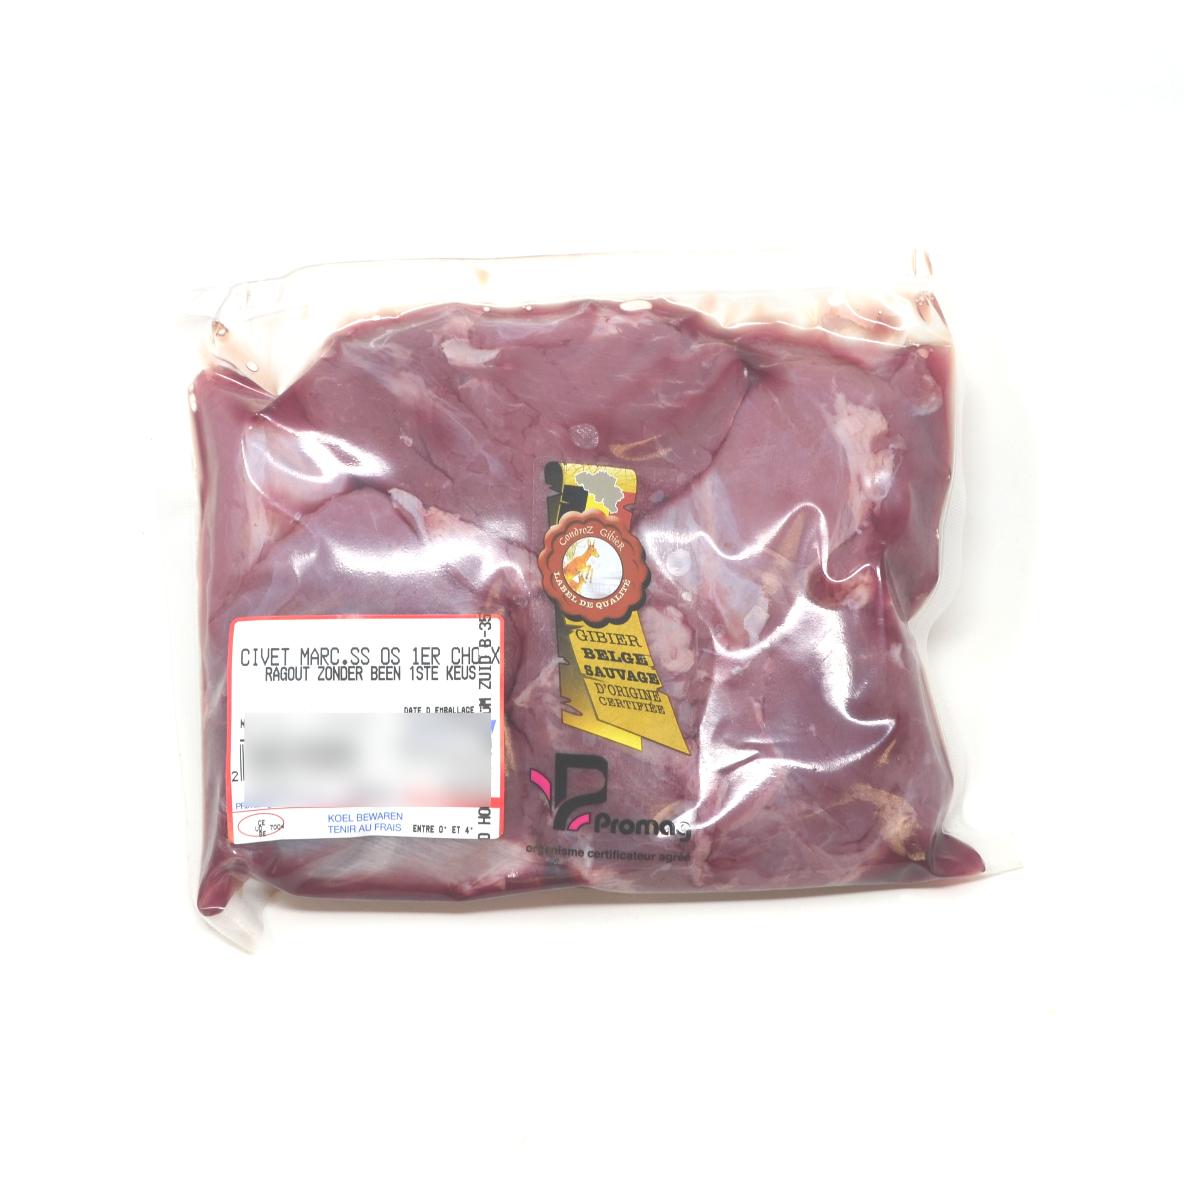 Civet de marcassin 1er choix +/- 500g